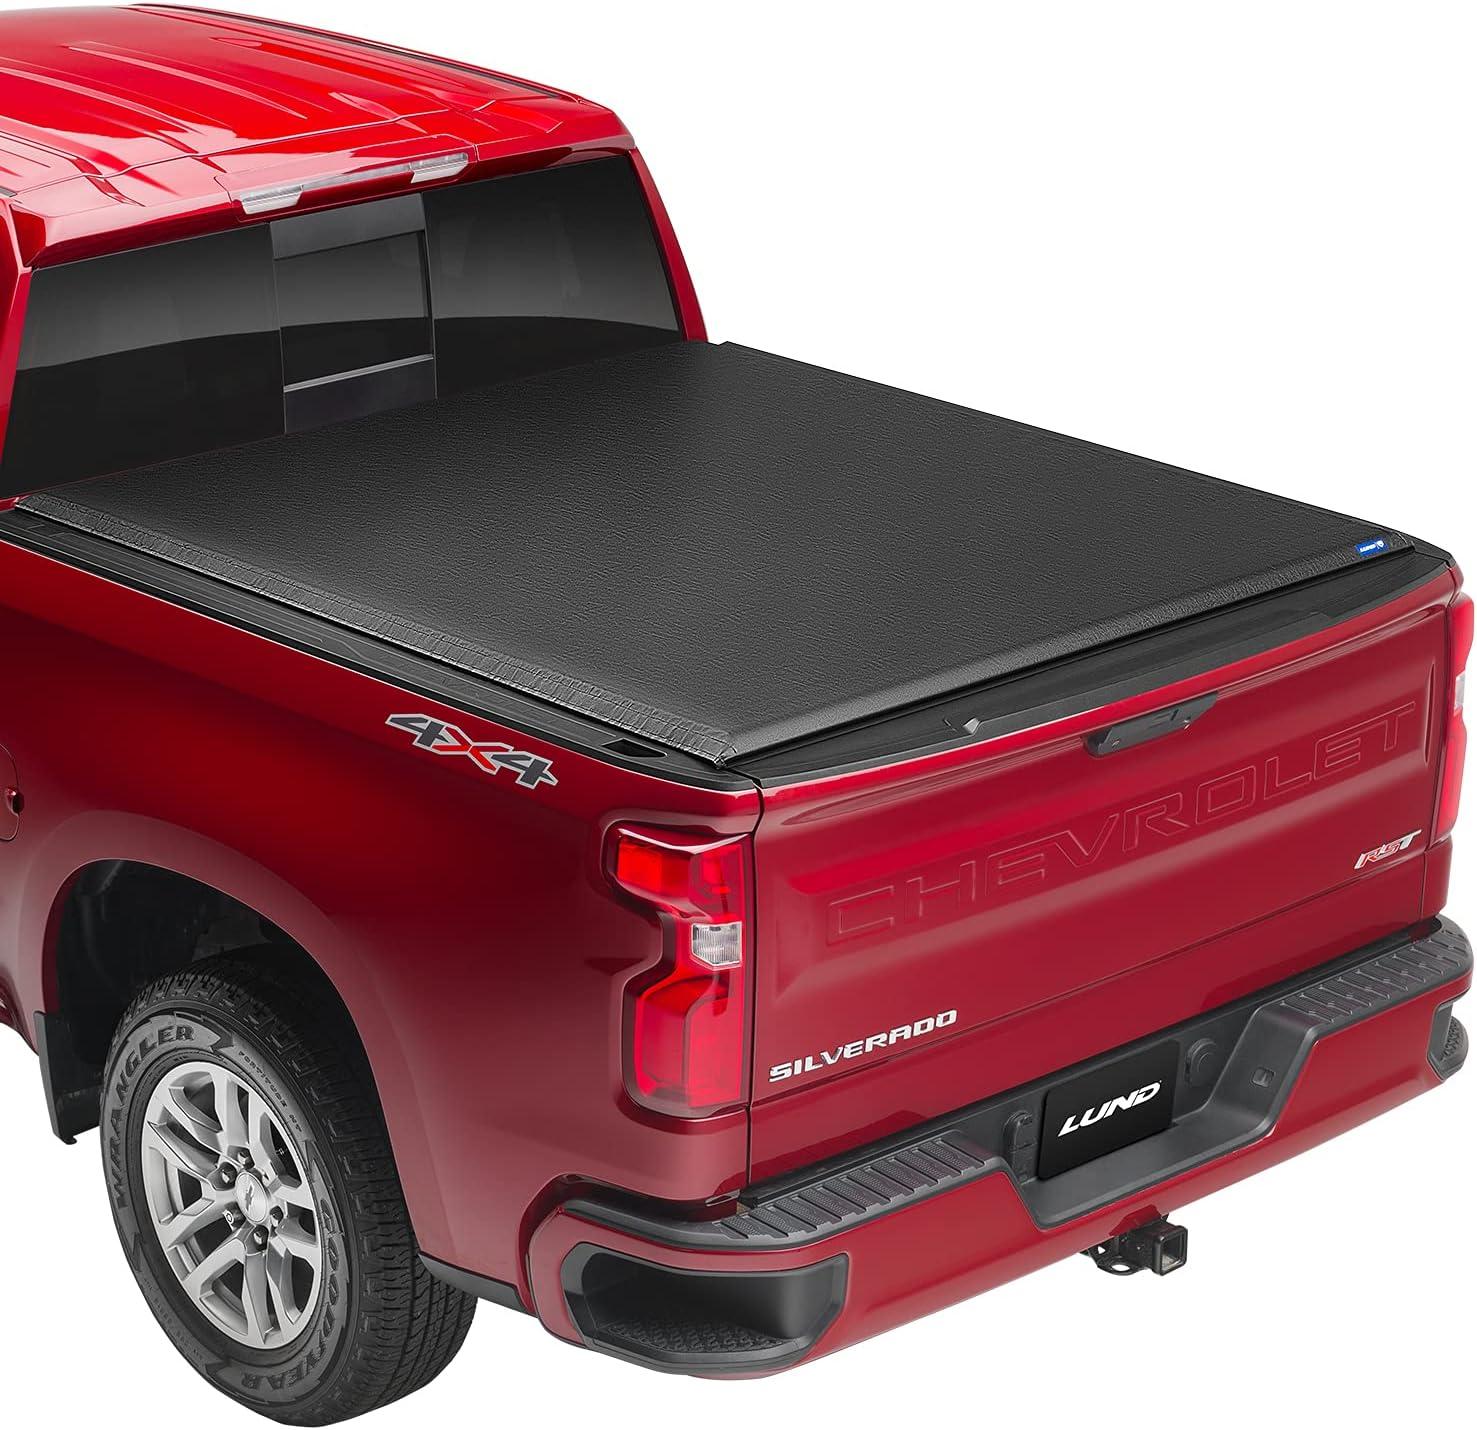 Lund Genesis Roll Up Soft 9600 Super sale period limited Truck Popular Cover Bed Tonneau